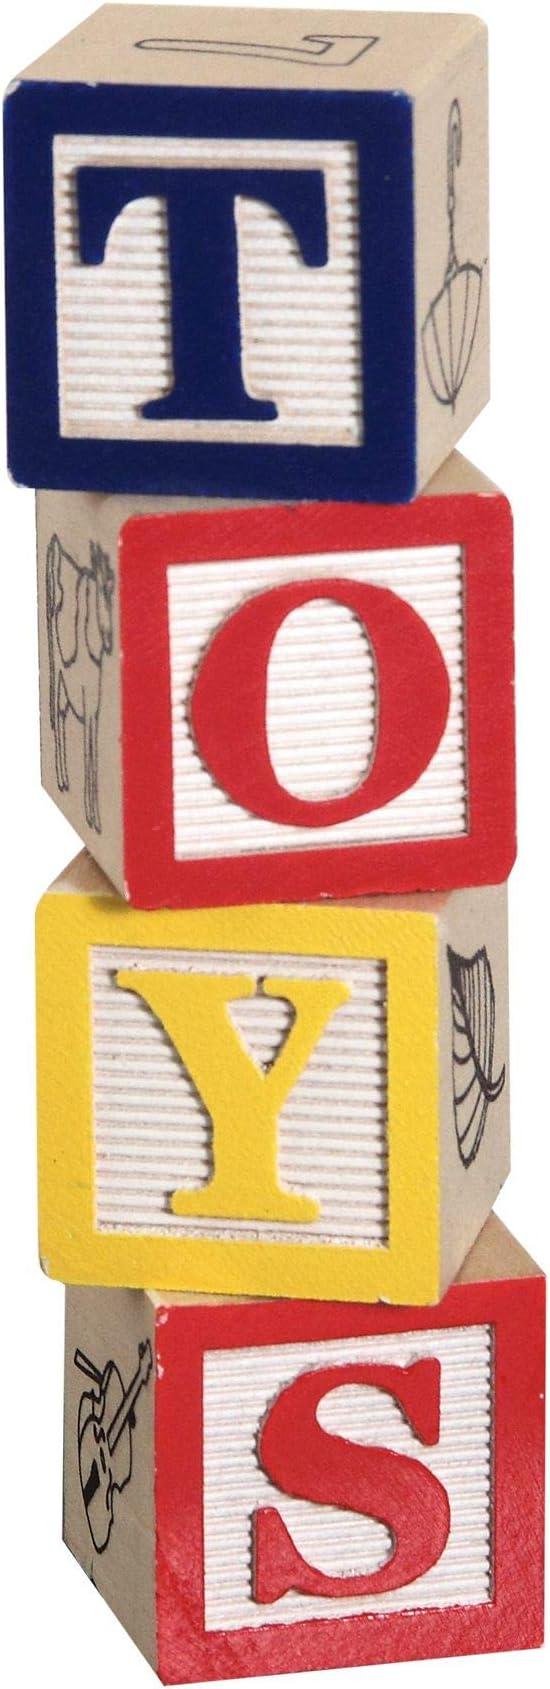 200 pièces-fun Stocking Filler! Magnétique Lettres